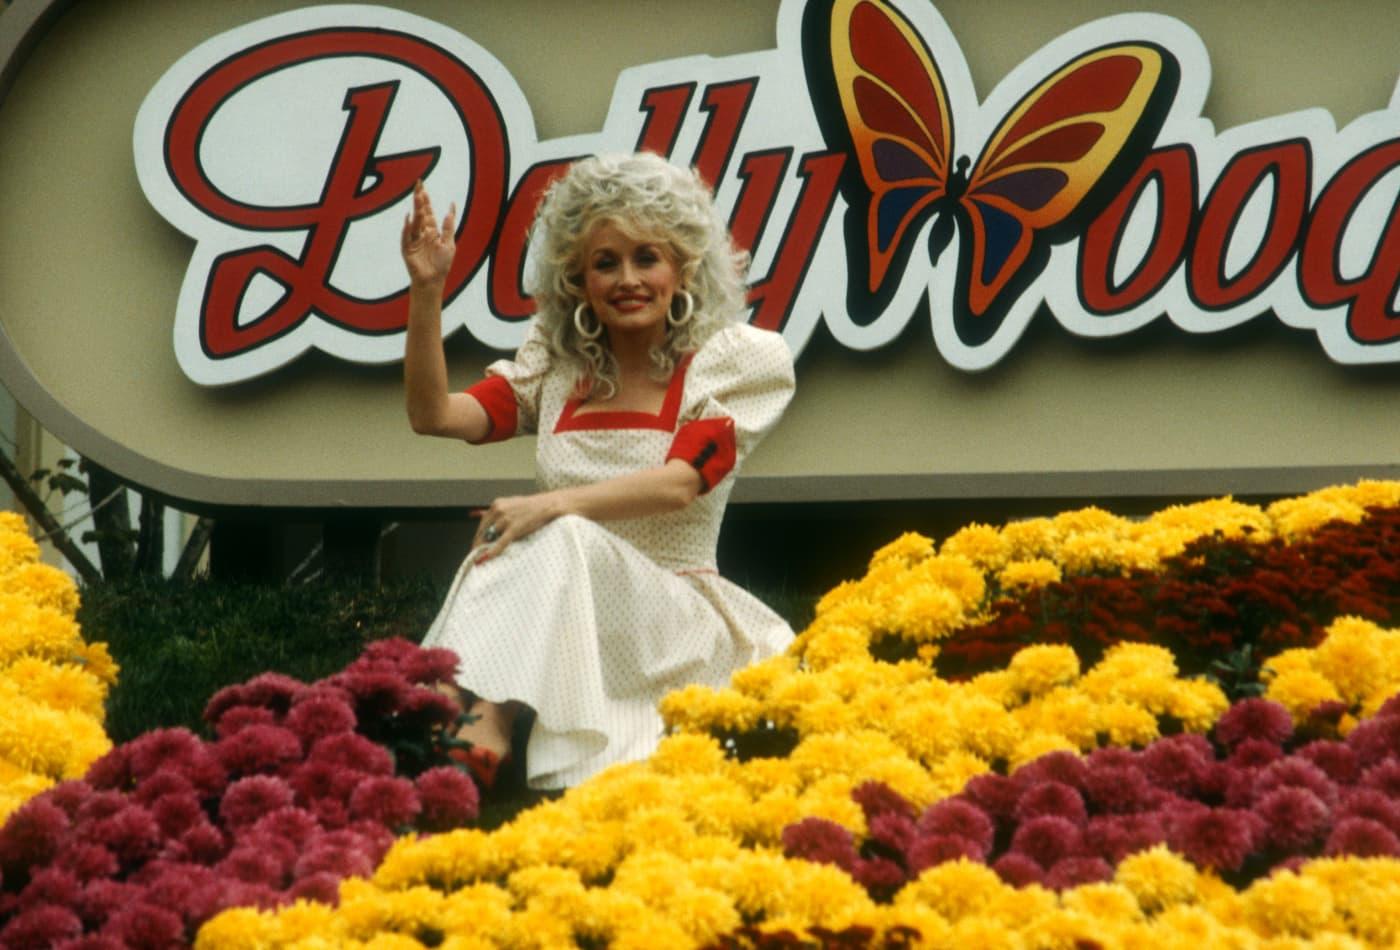 Photos: Dolly Parton's Dollywood theme park opened new